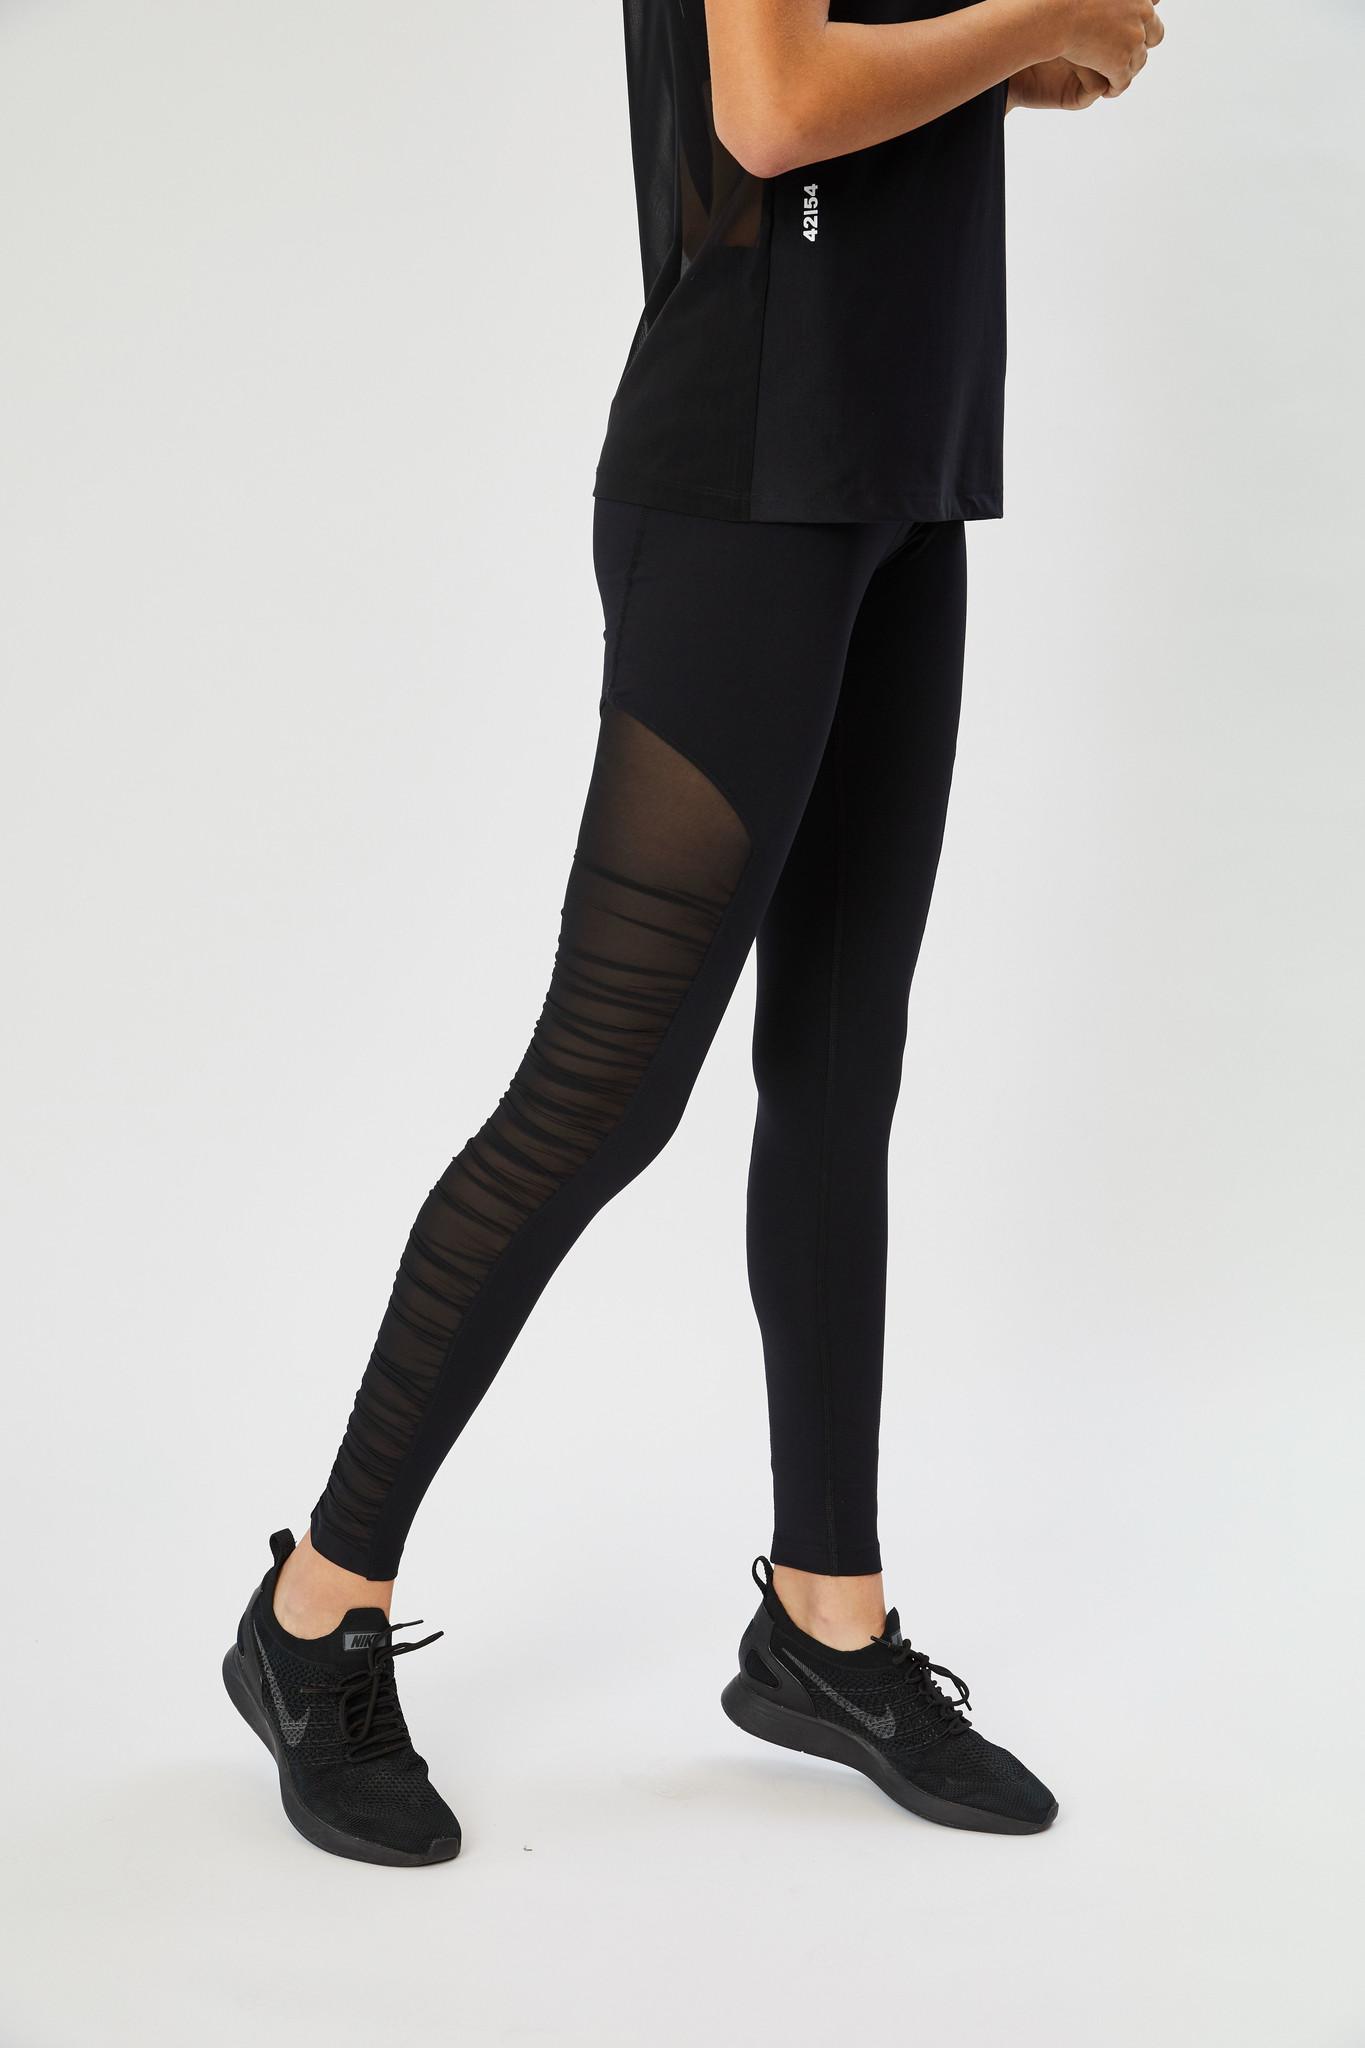 42|54 Ruched leggings